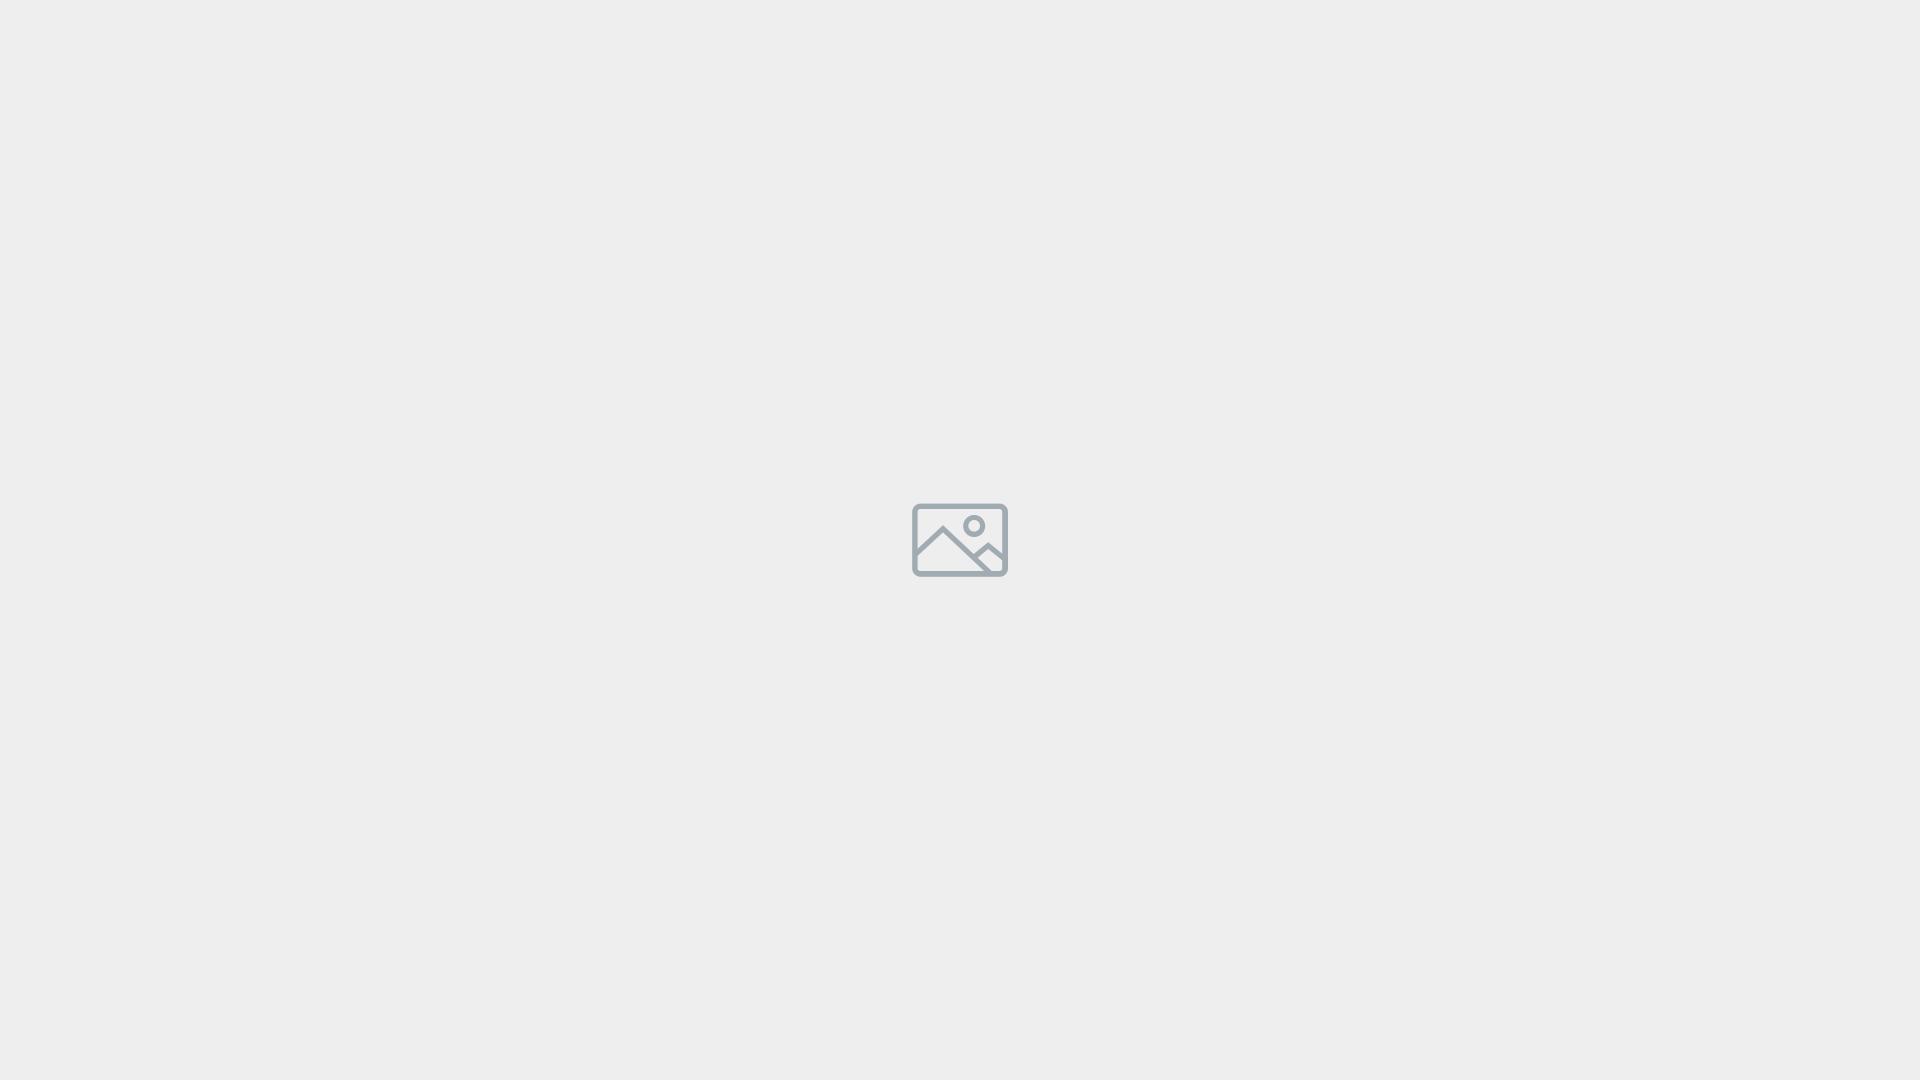 FB-1200x717-Timeline-Bobby-Wenn